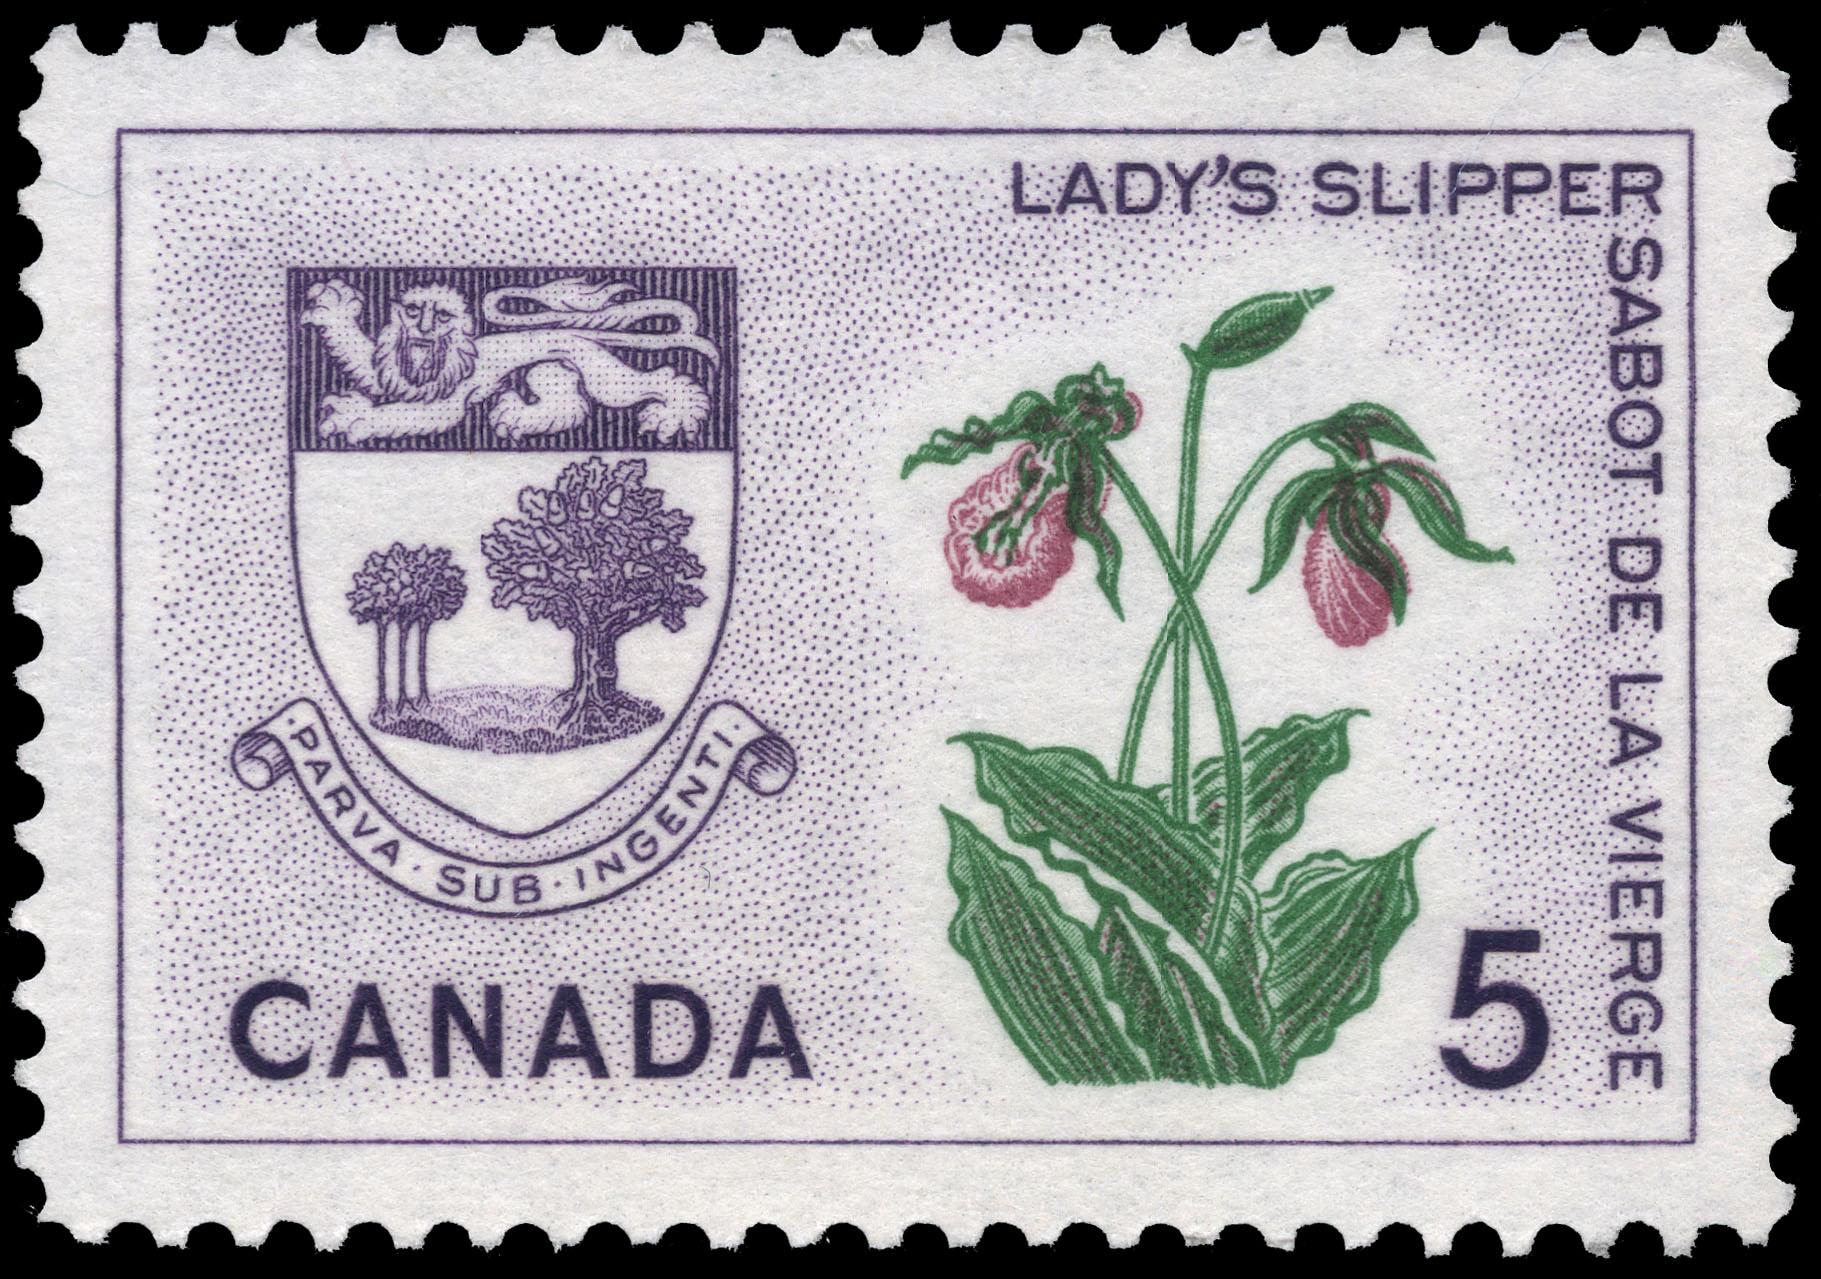 Lady's Slipper, Prince Edward Island Canada Postage Stamp | Floral Emblems